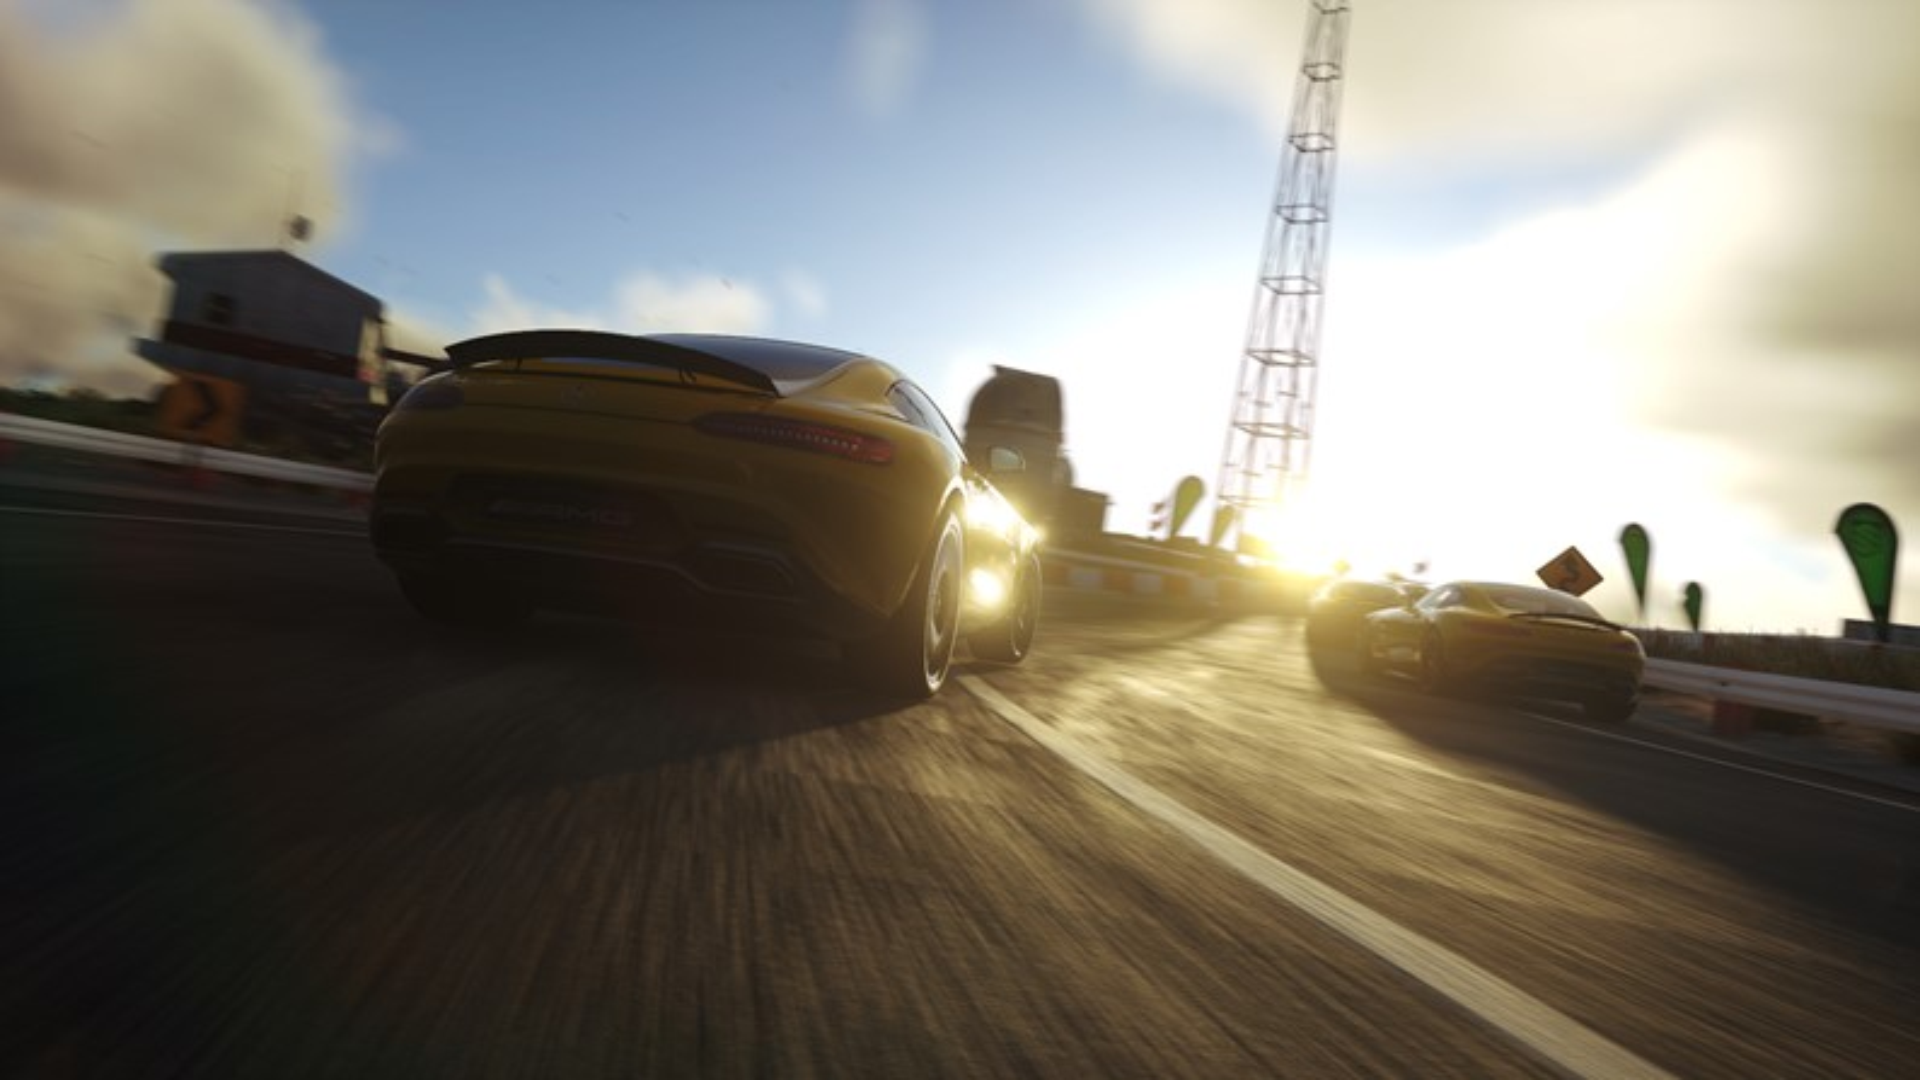 Mercedes-Benz estreia carro exclusivo em DriveClub